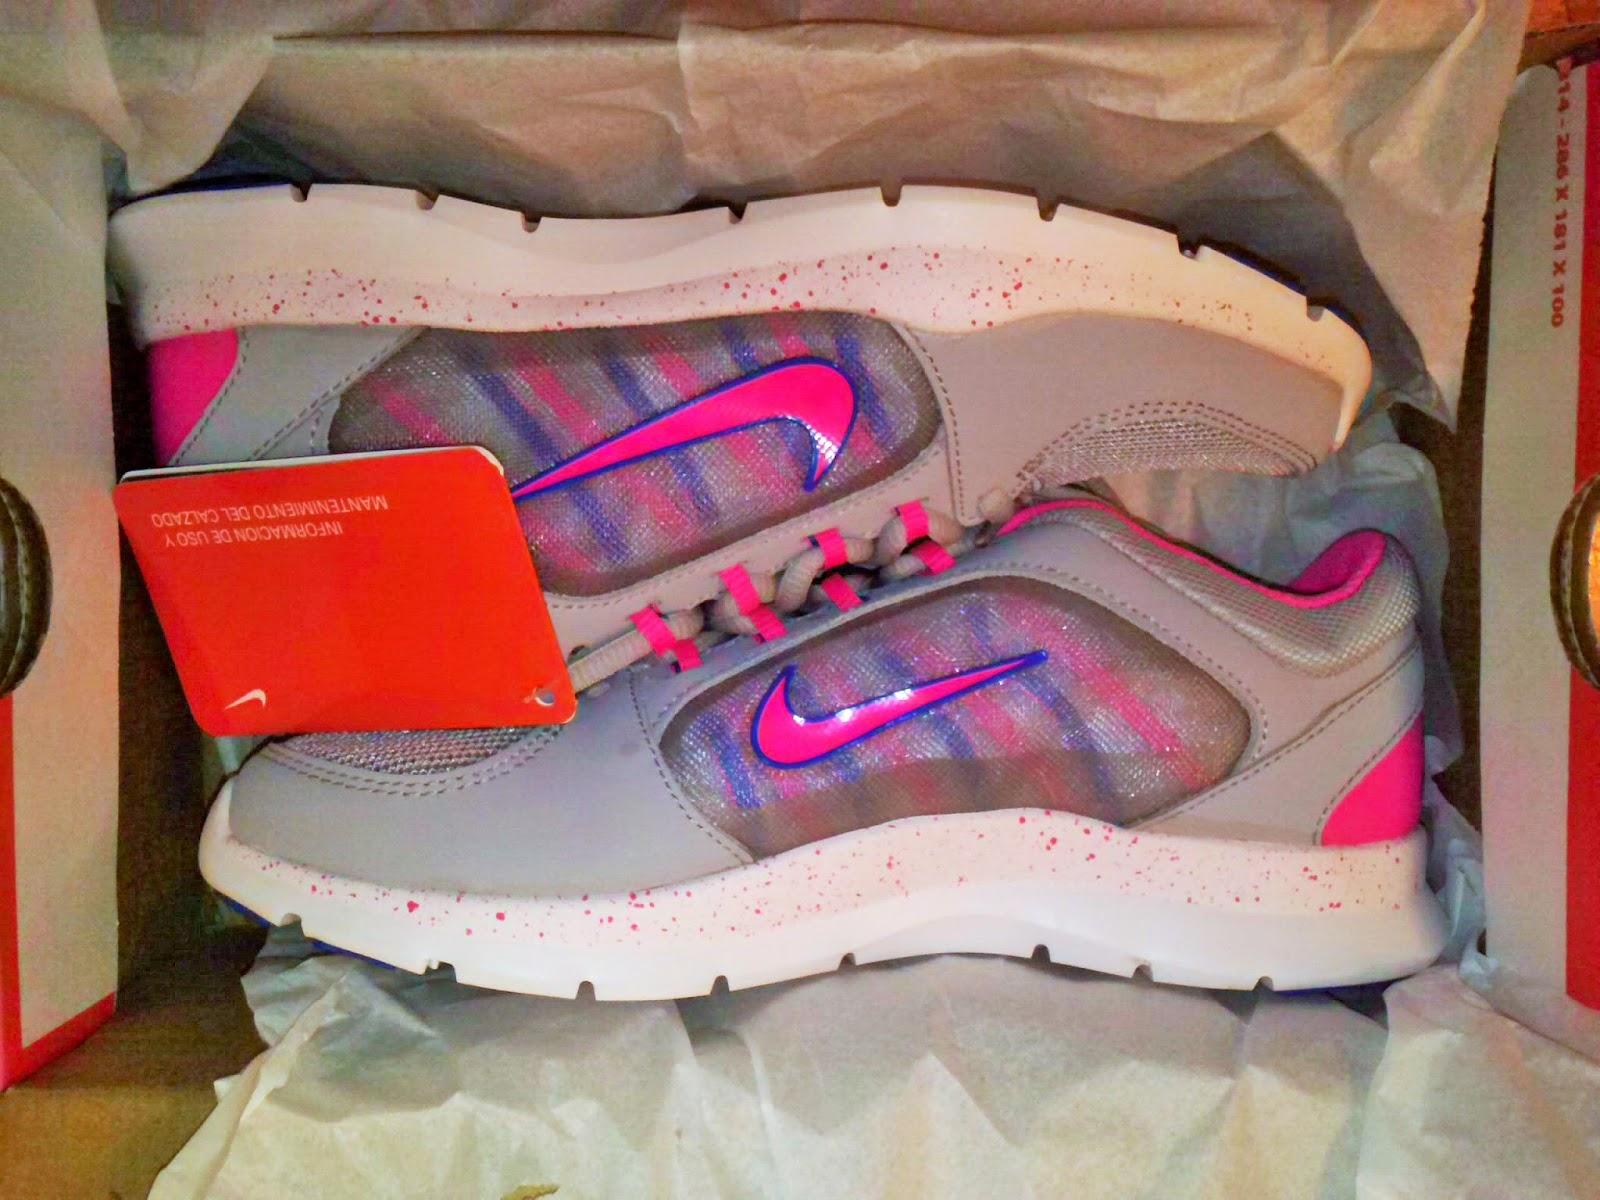 81e7487 comprá zapatillas nike air flex trainer 2 online